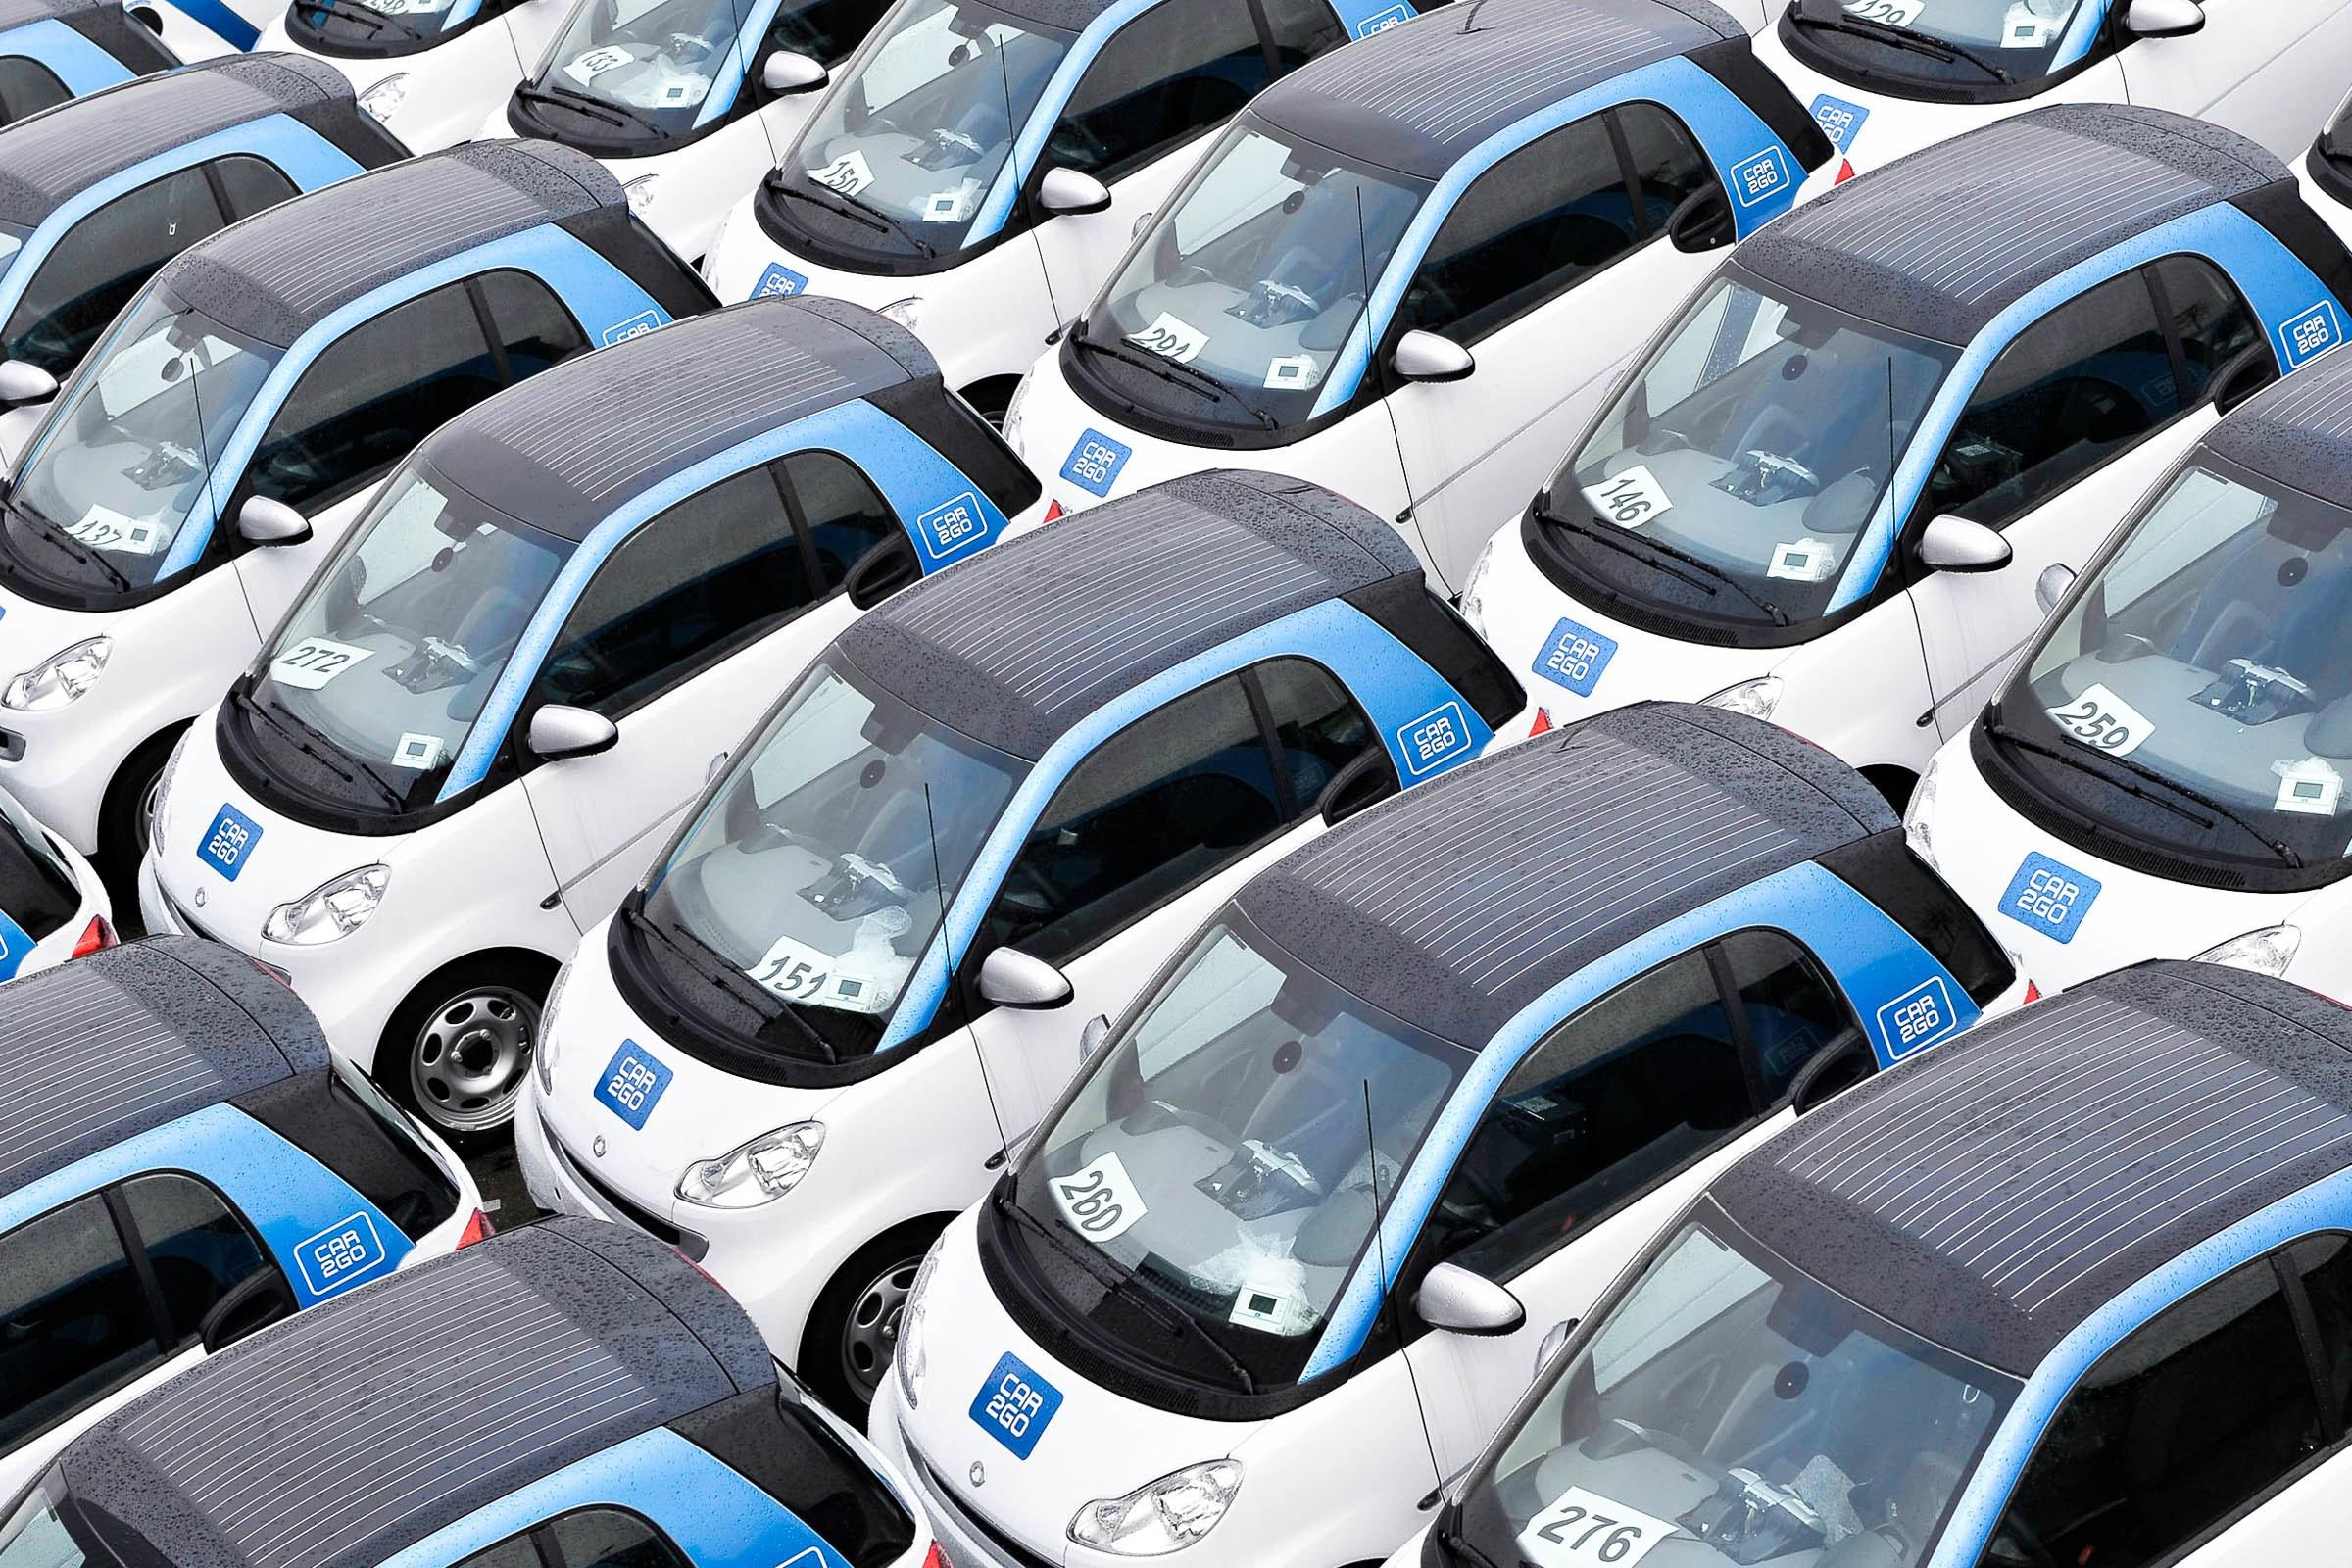 car2go vehicles